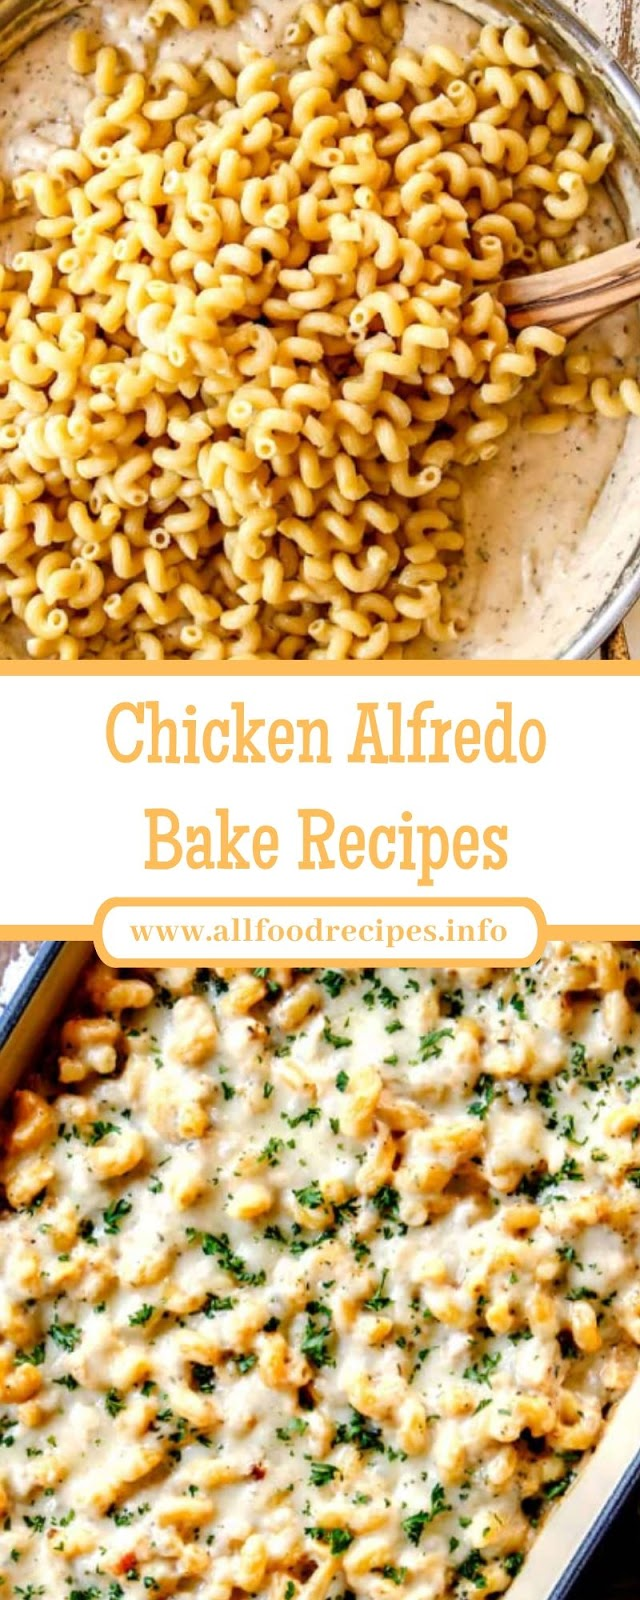 Chicken Alfredo Bake Recipes